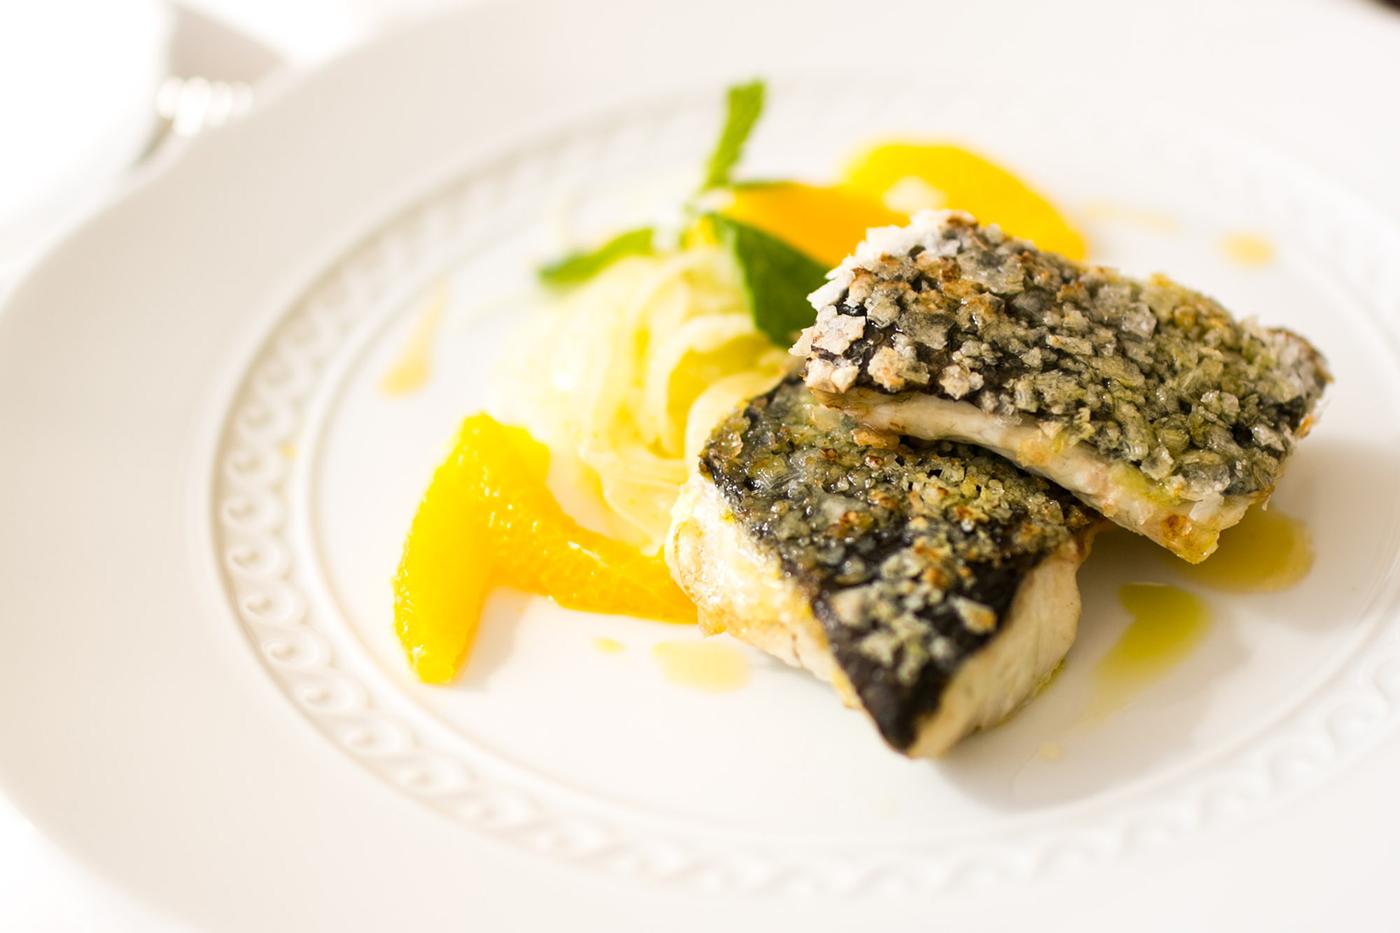 joee-wong-belmond-hotels-italy-food15